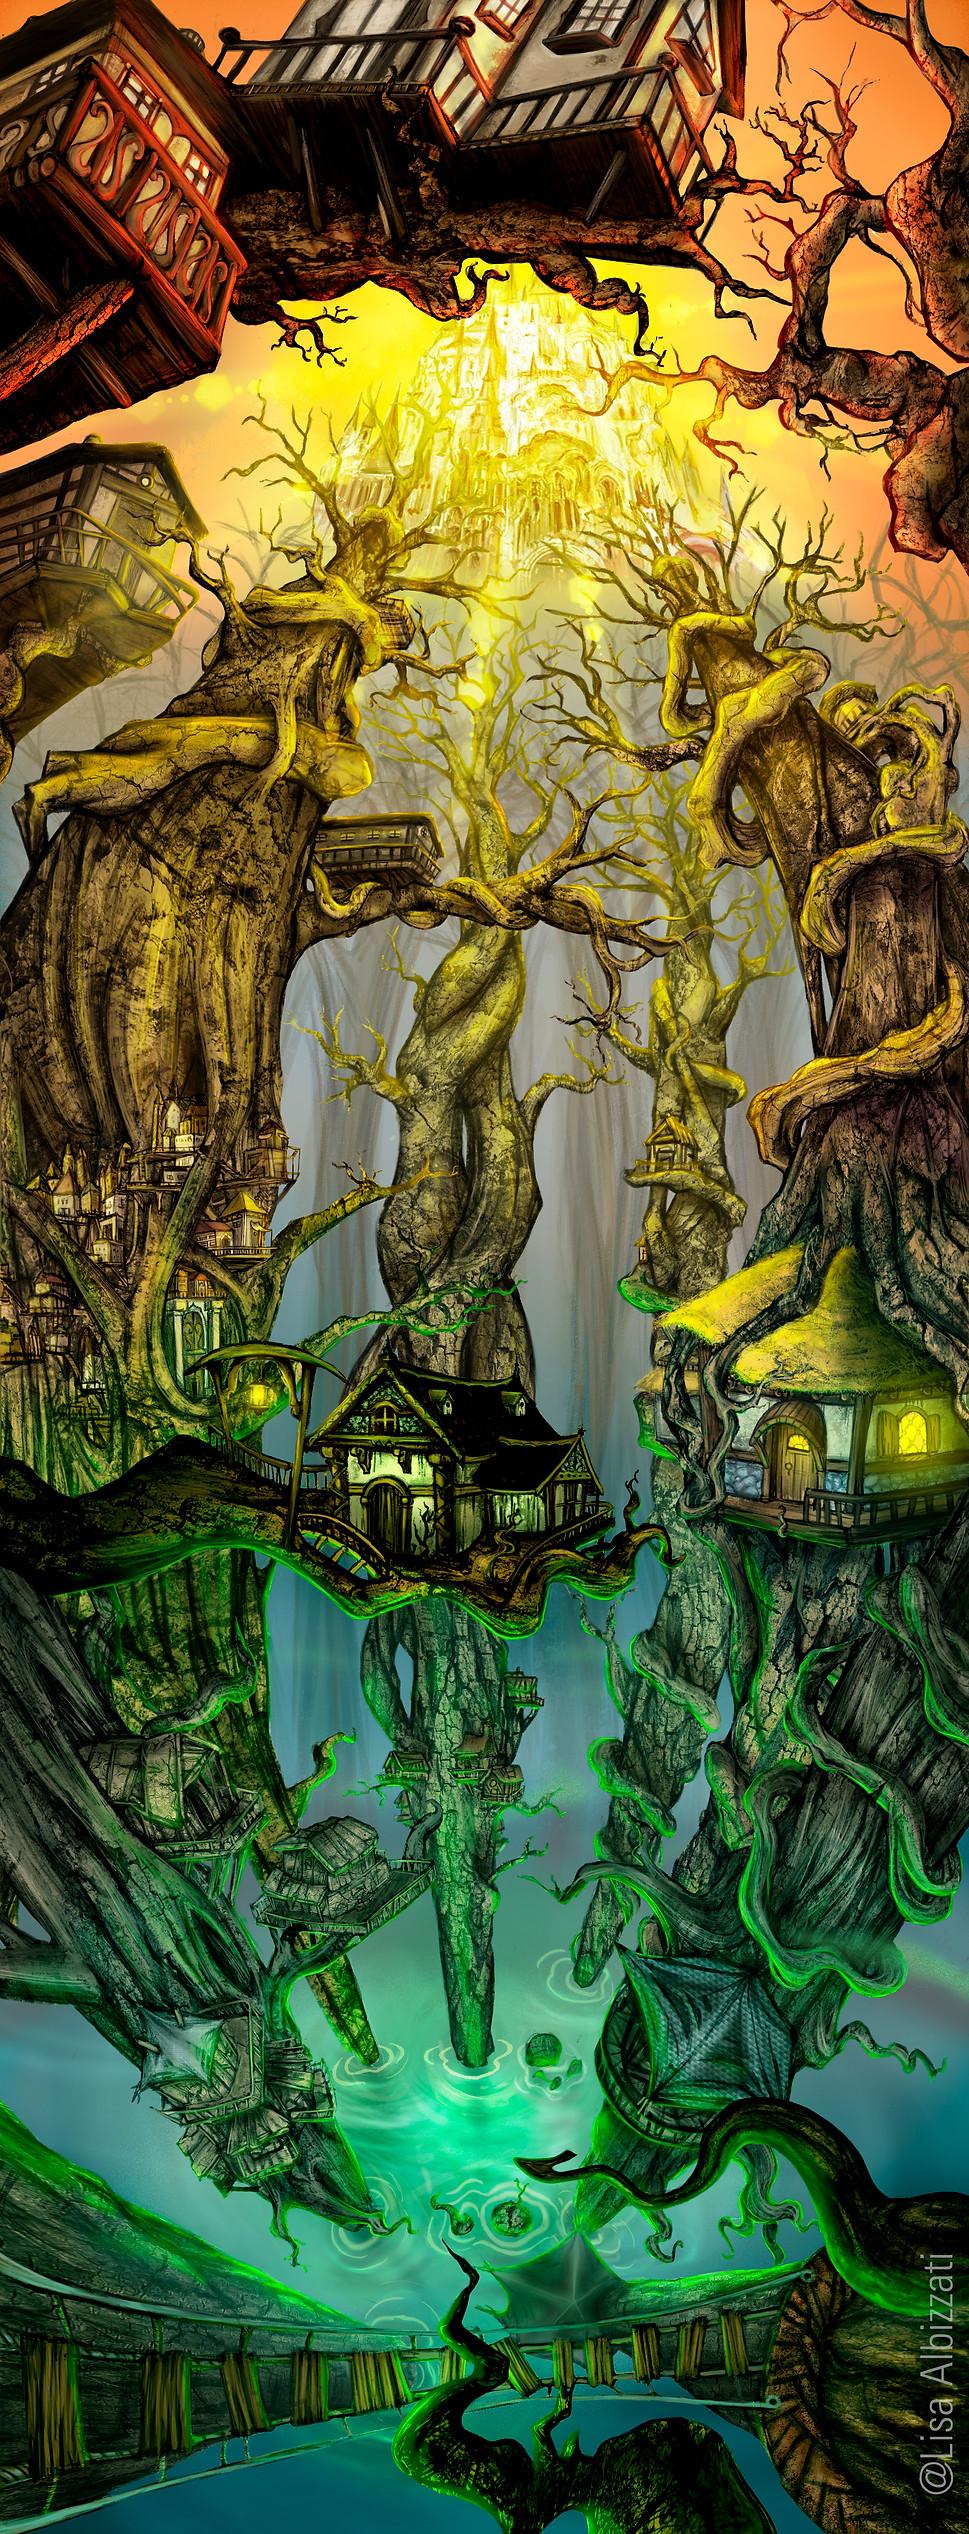 Lisa Albizzati, City on the trees, Fantasy Illustration